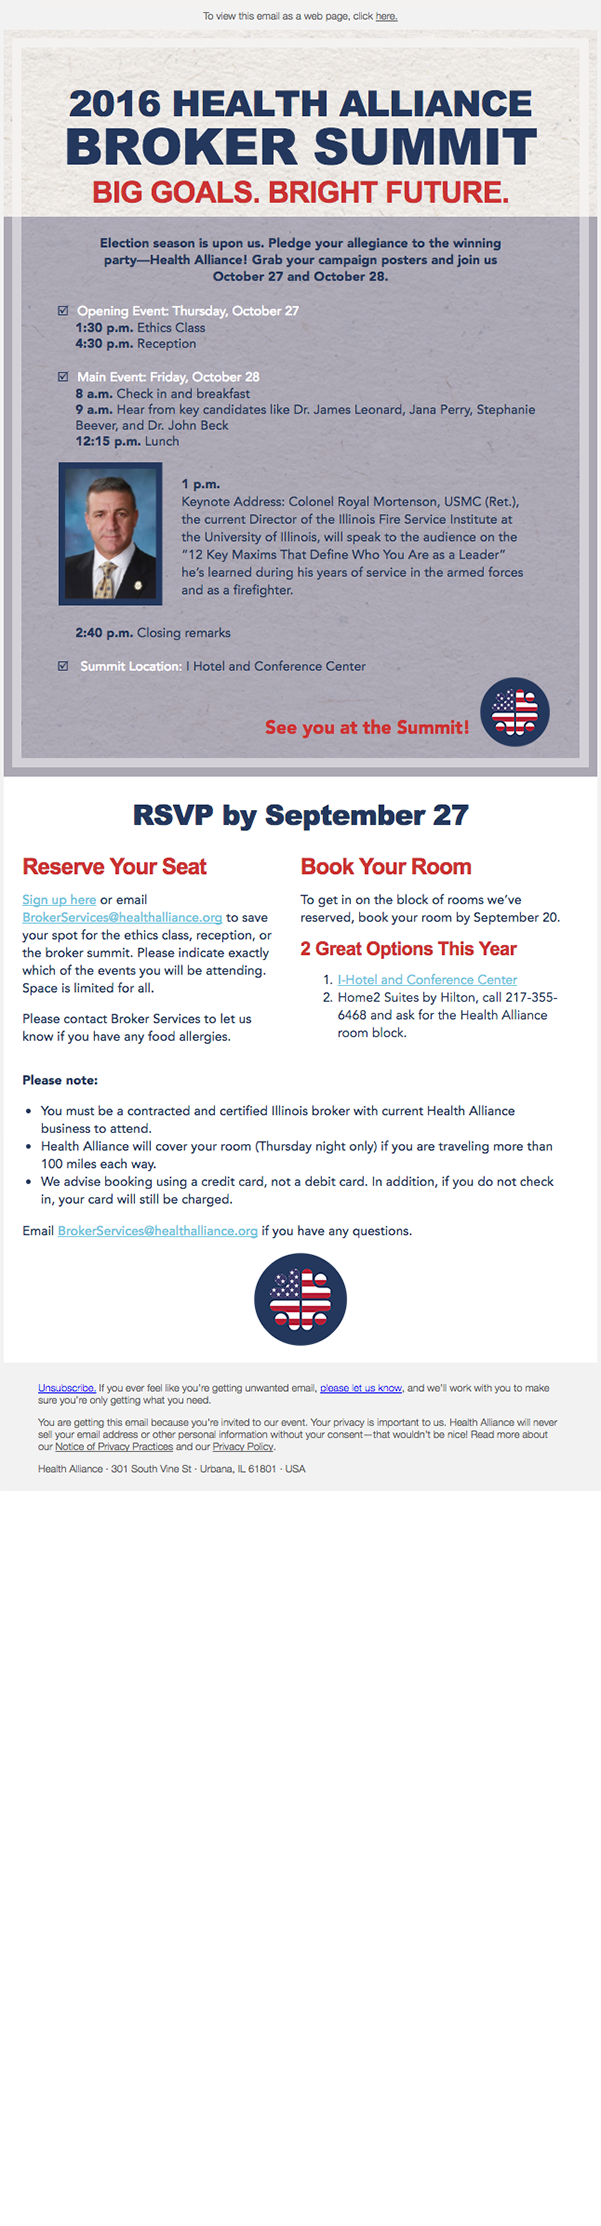 Broker Summit 2016 Invite